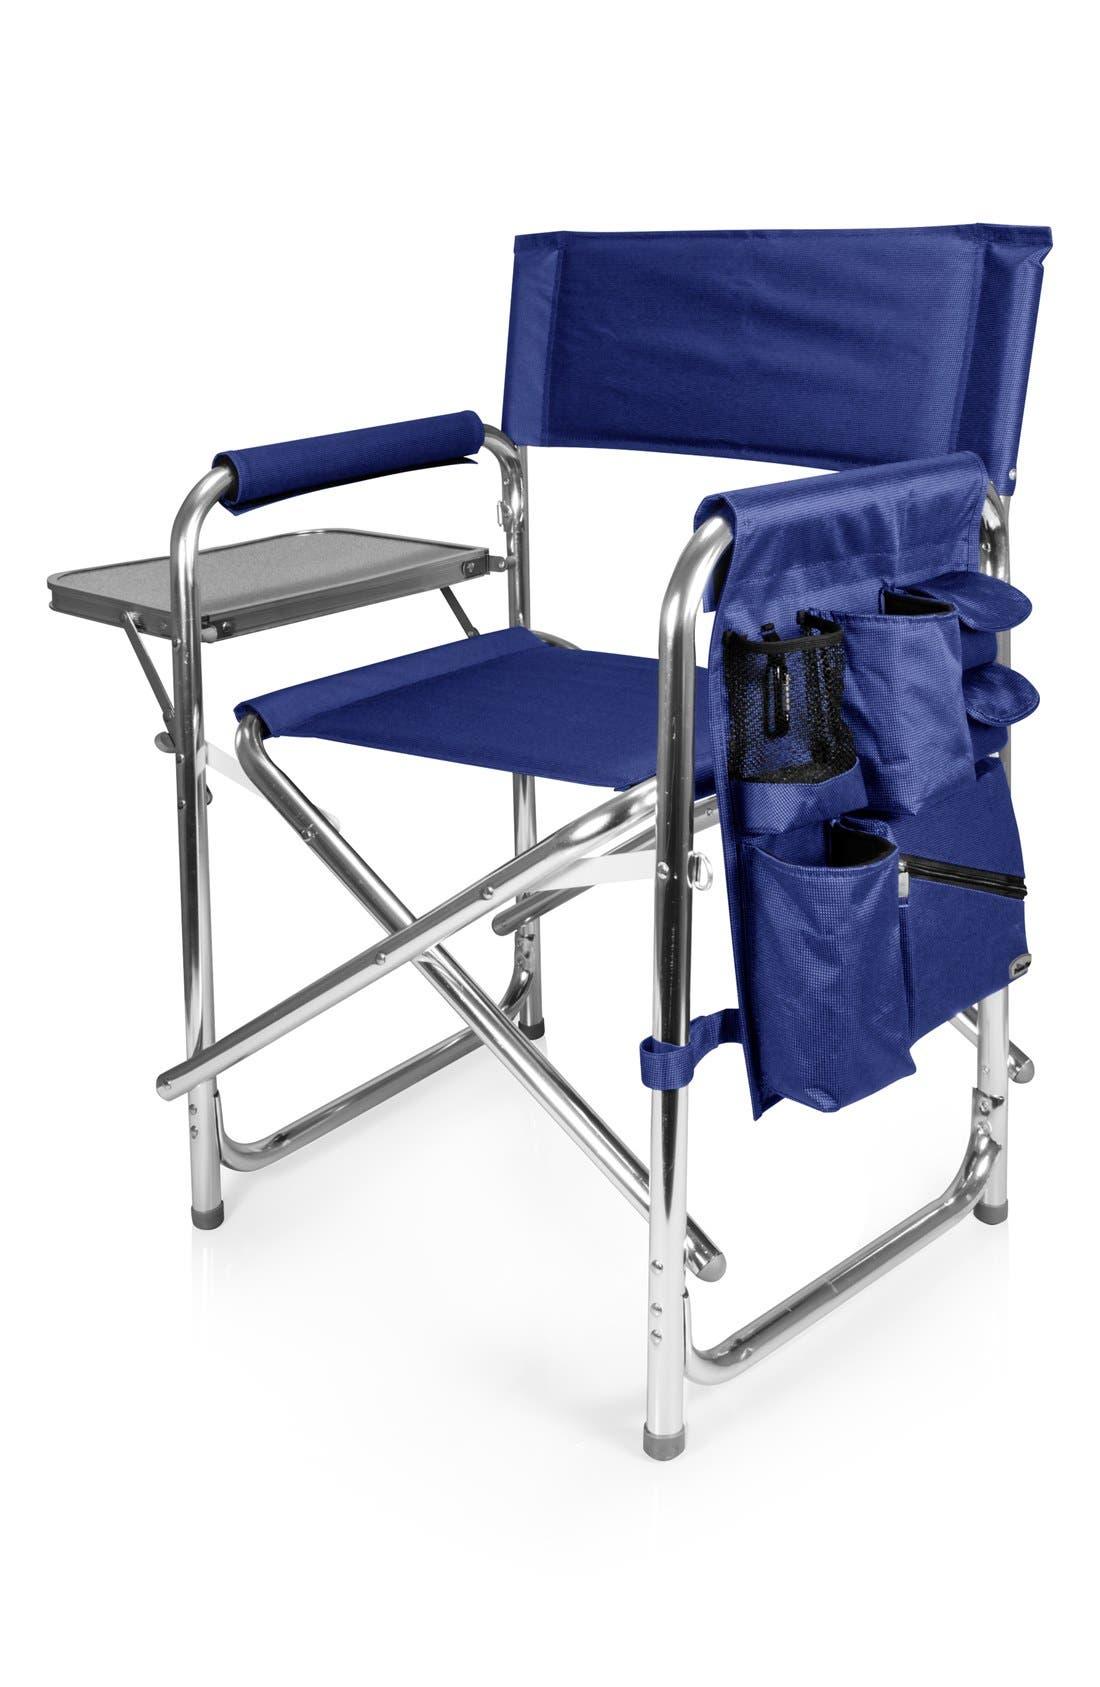 PICNIC TIME 'Sports' Folding Chair